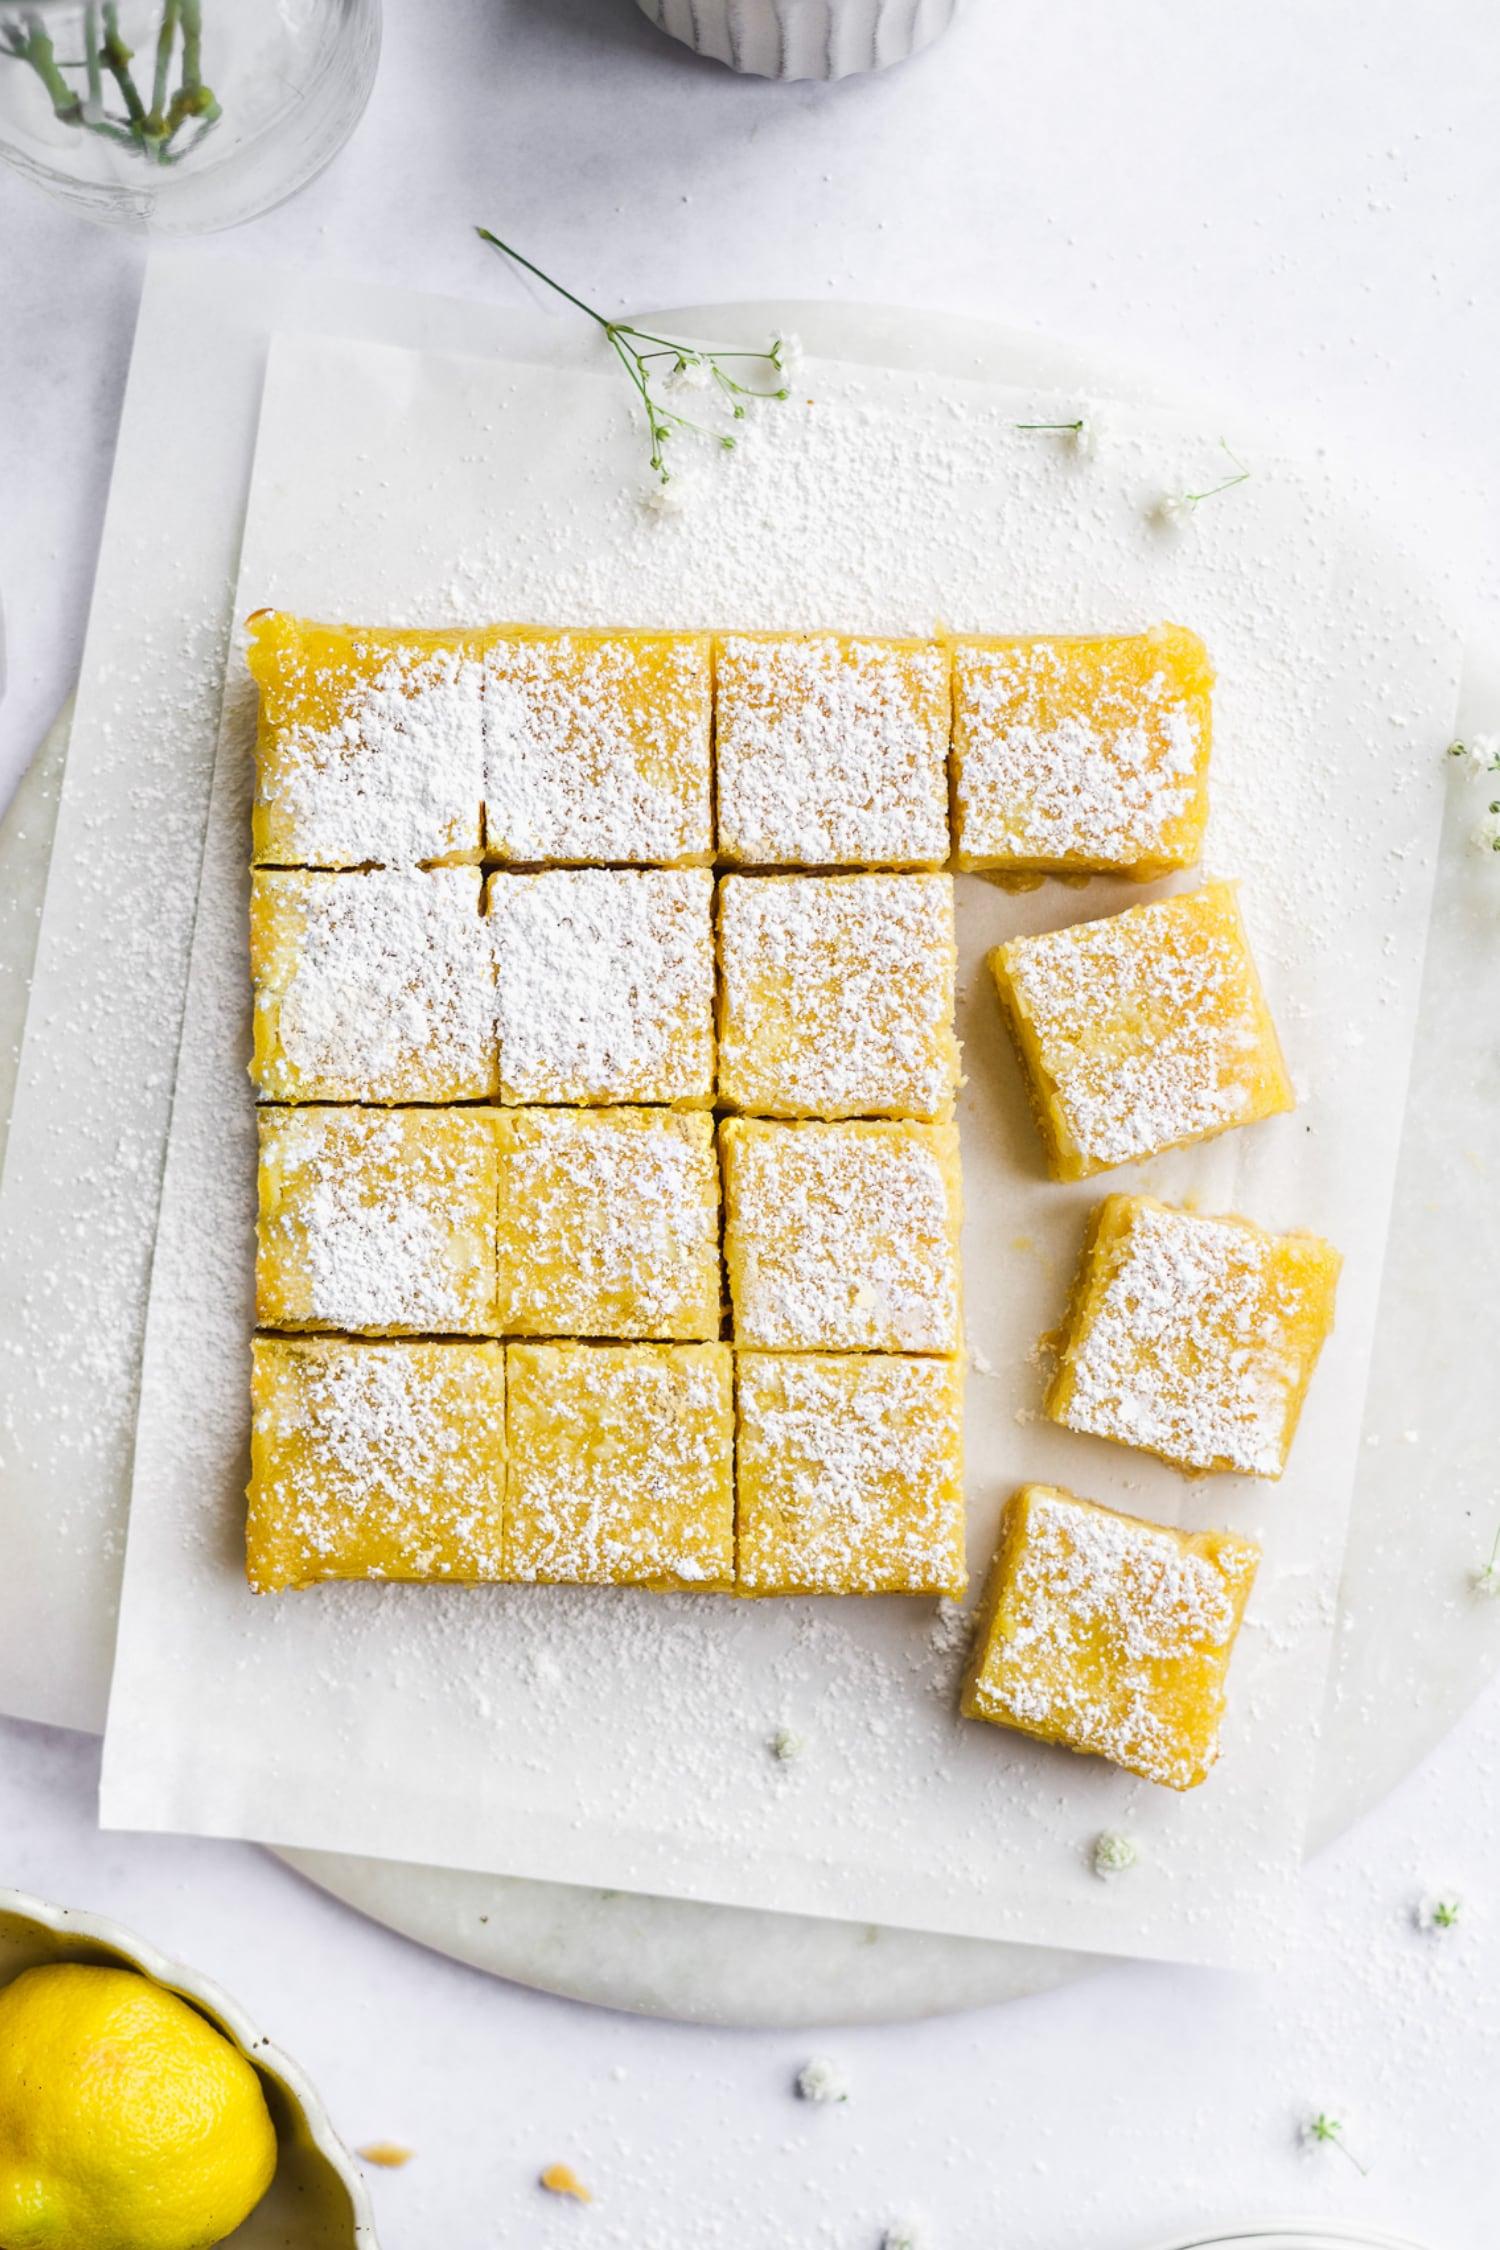 a batch of healthy lemon bars on wax paper